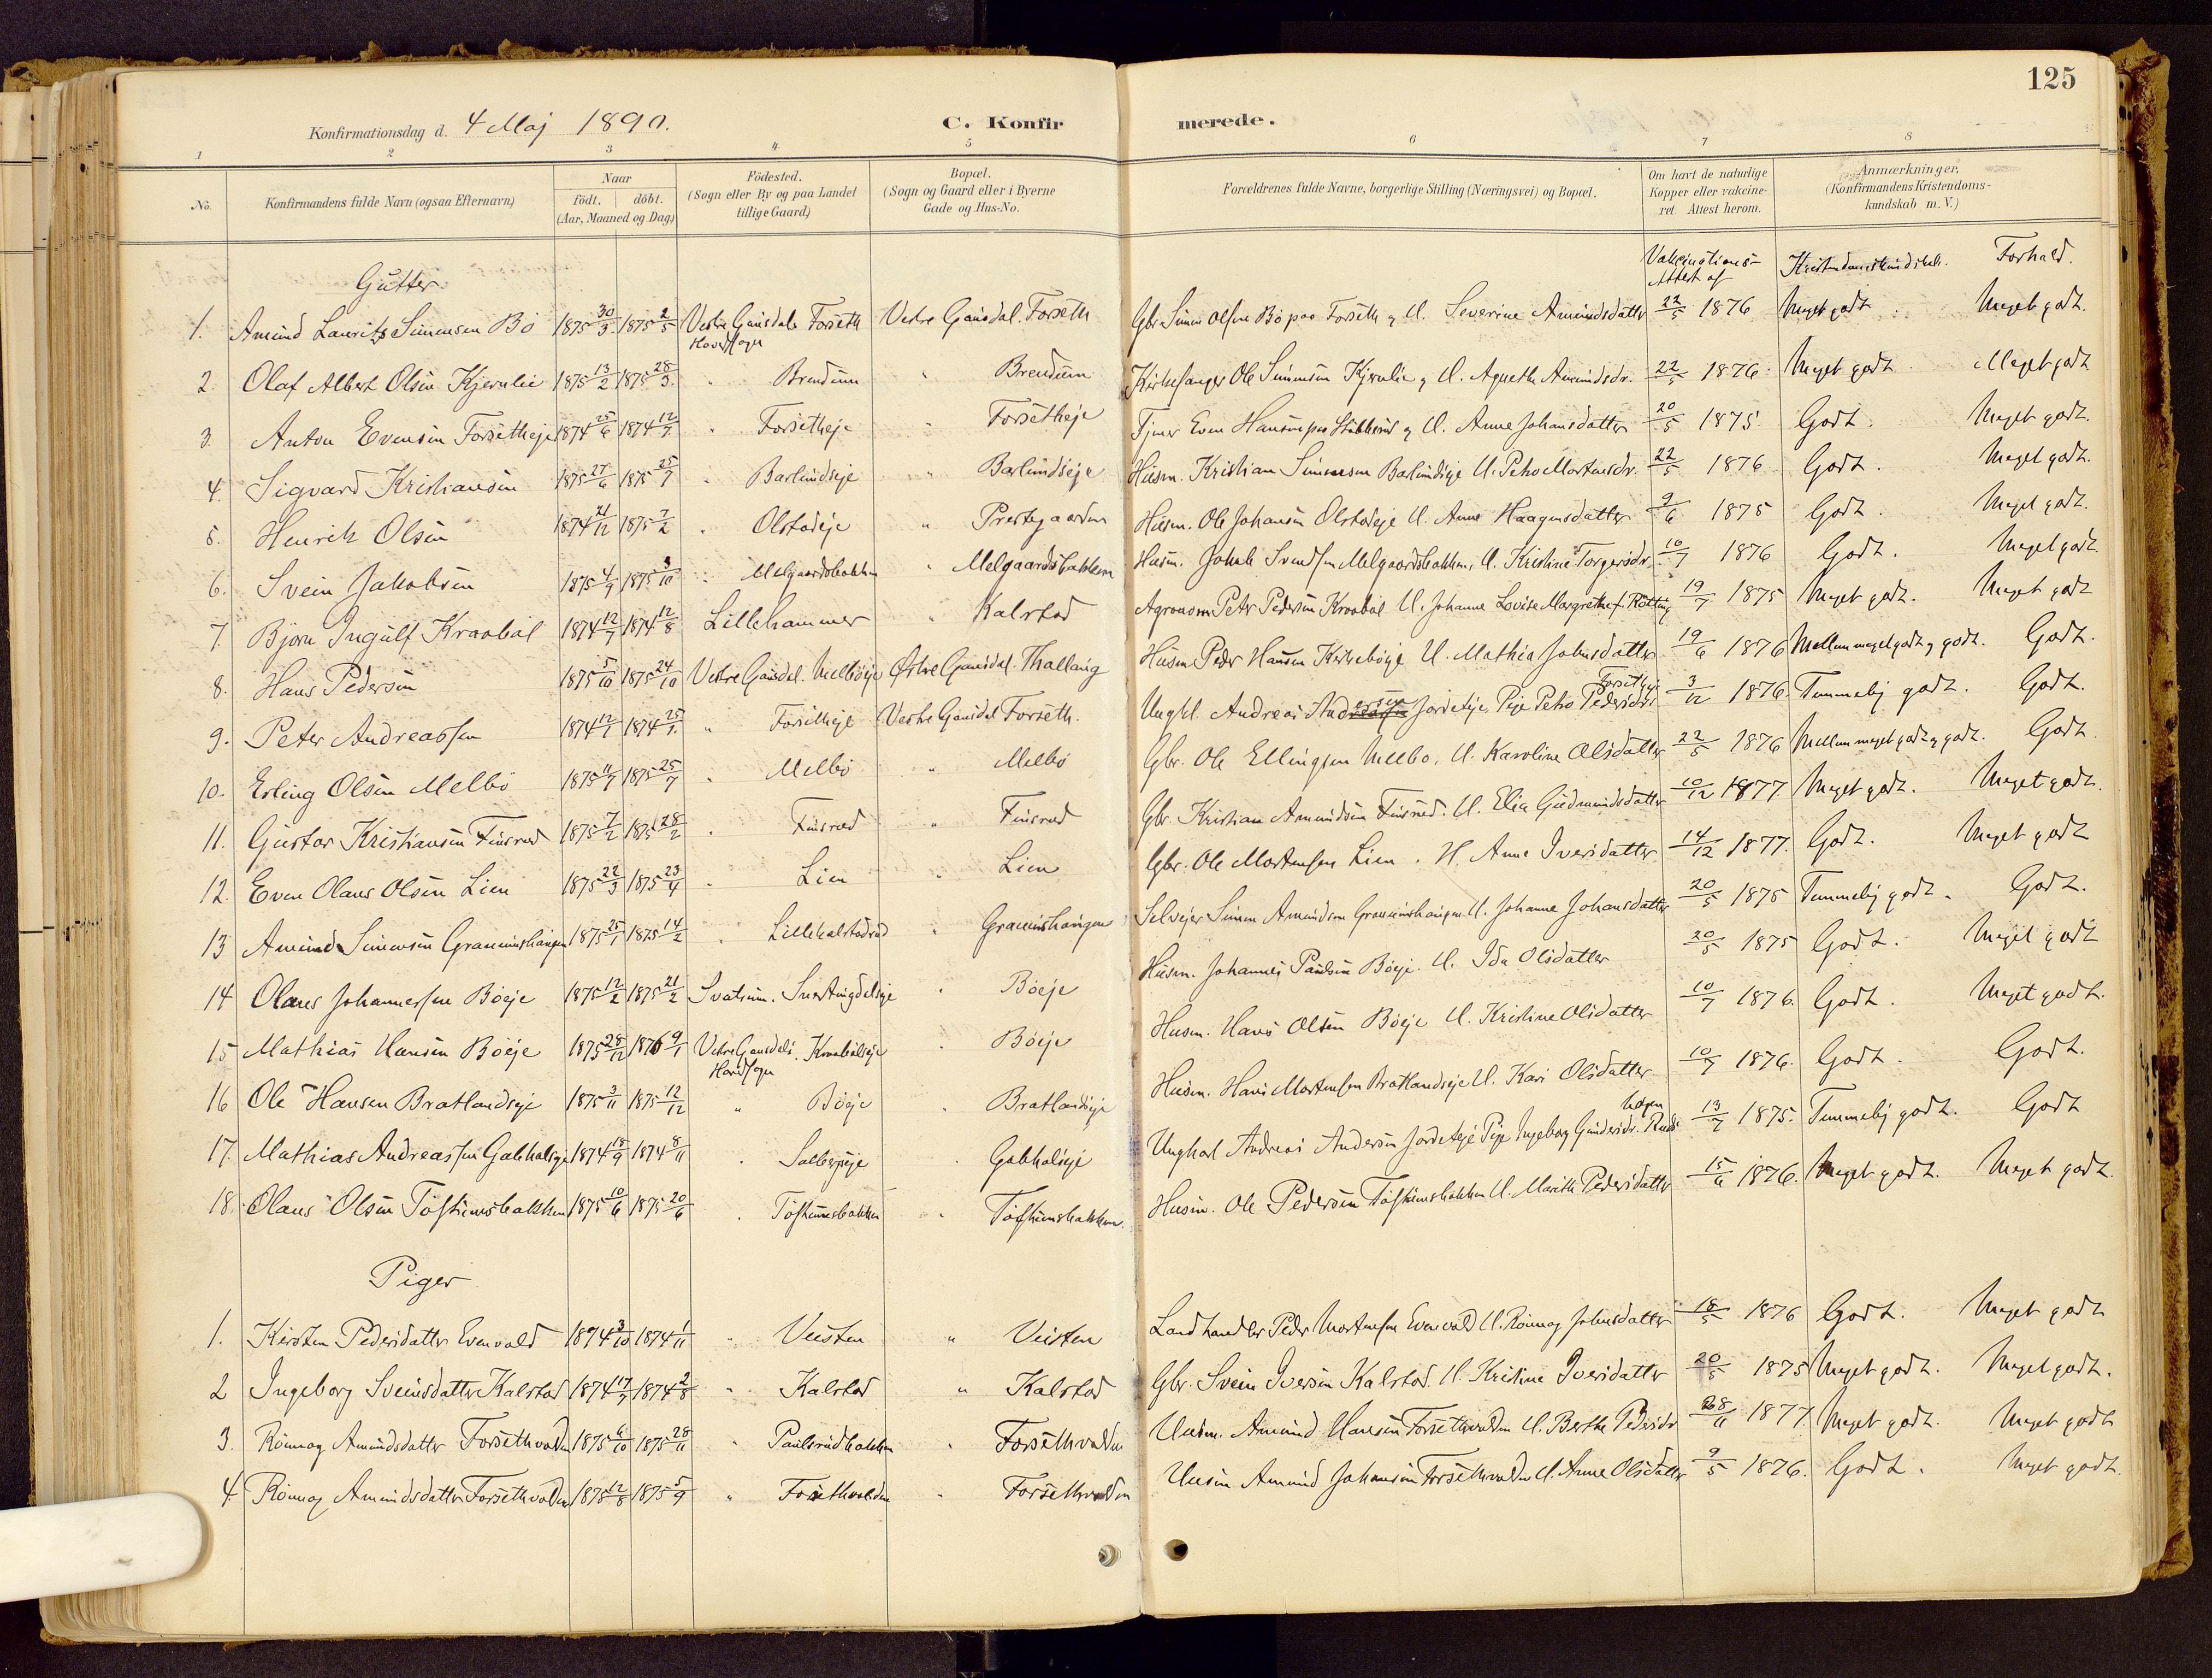 SAH, Vestre Gausdal prestekontor, Ministerialbok nr. 1, 1887-1914, s. 125